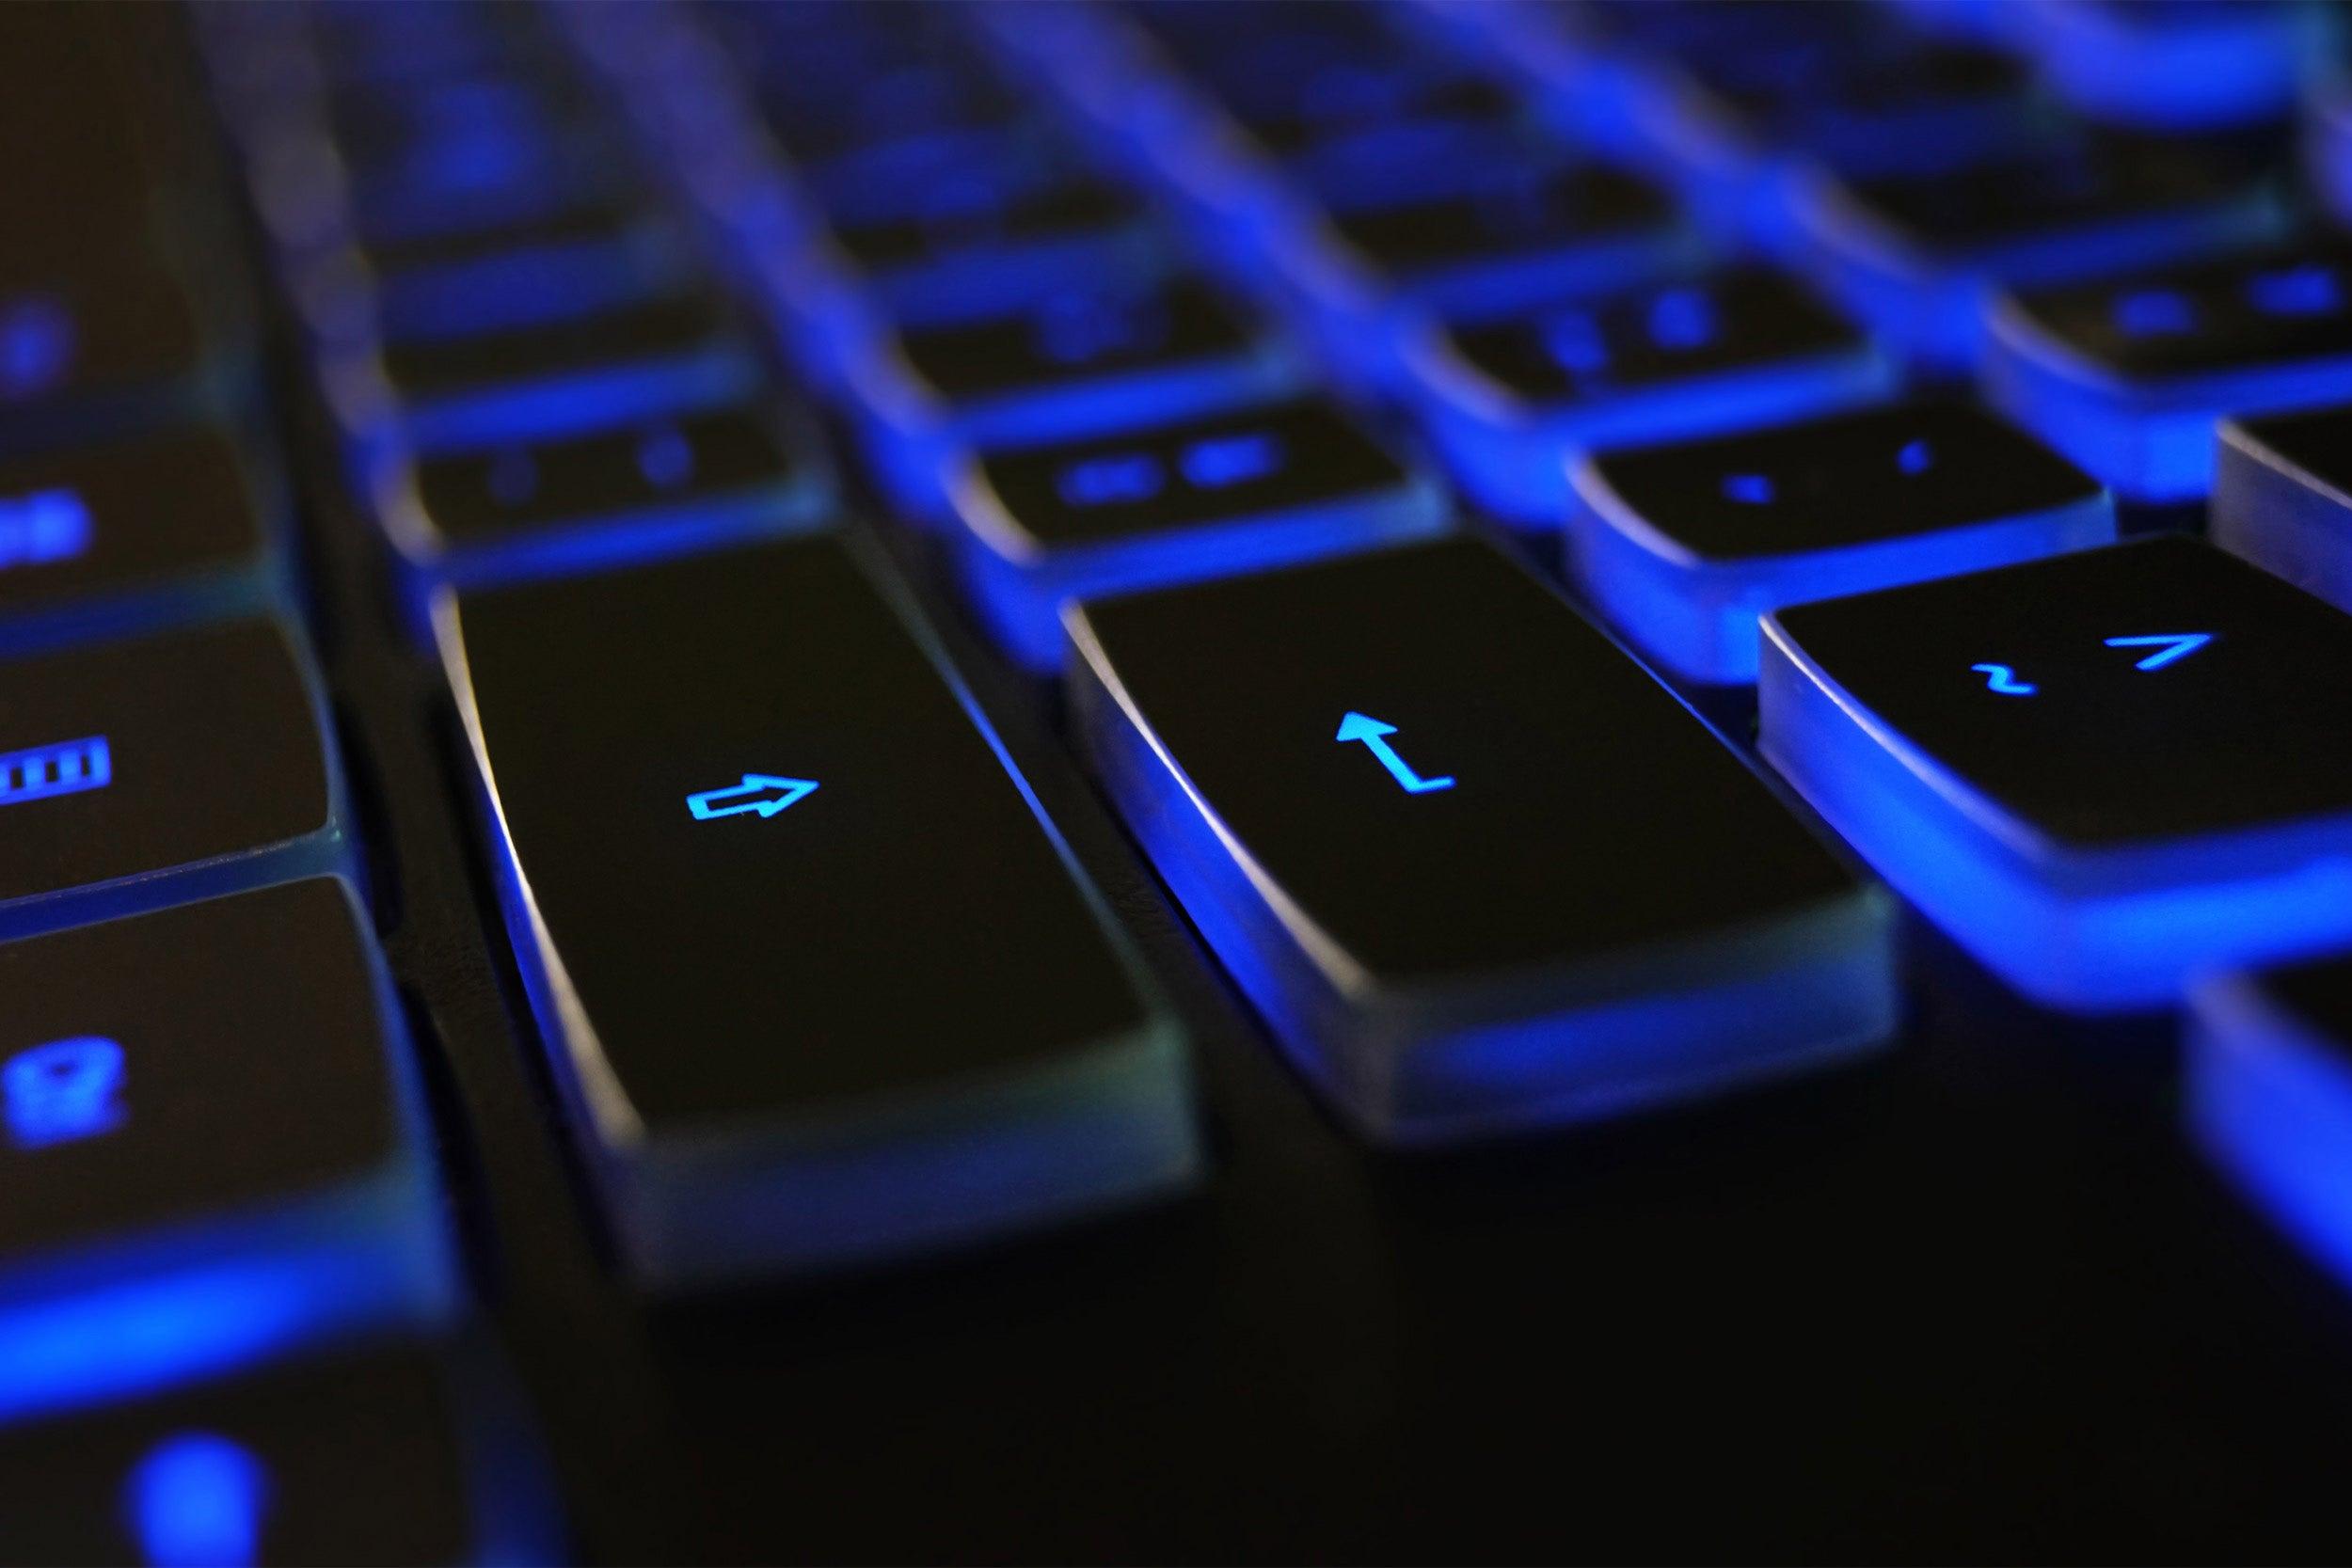 Computer keyboard symbolizing digital access